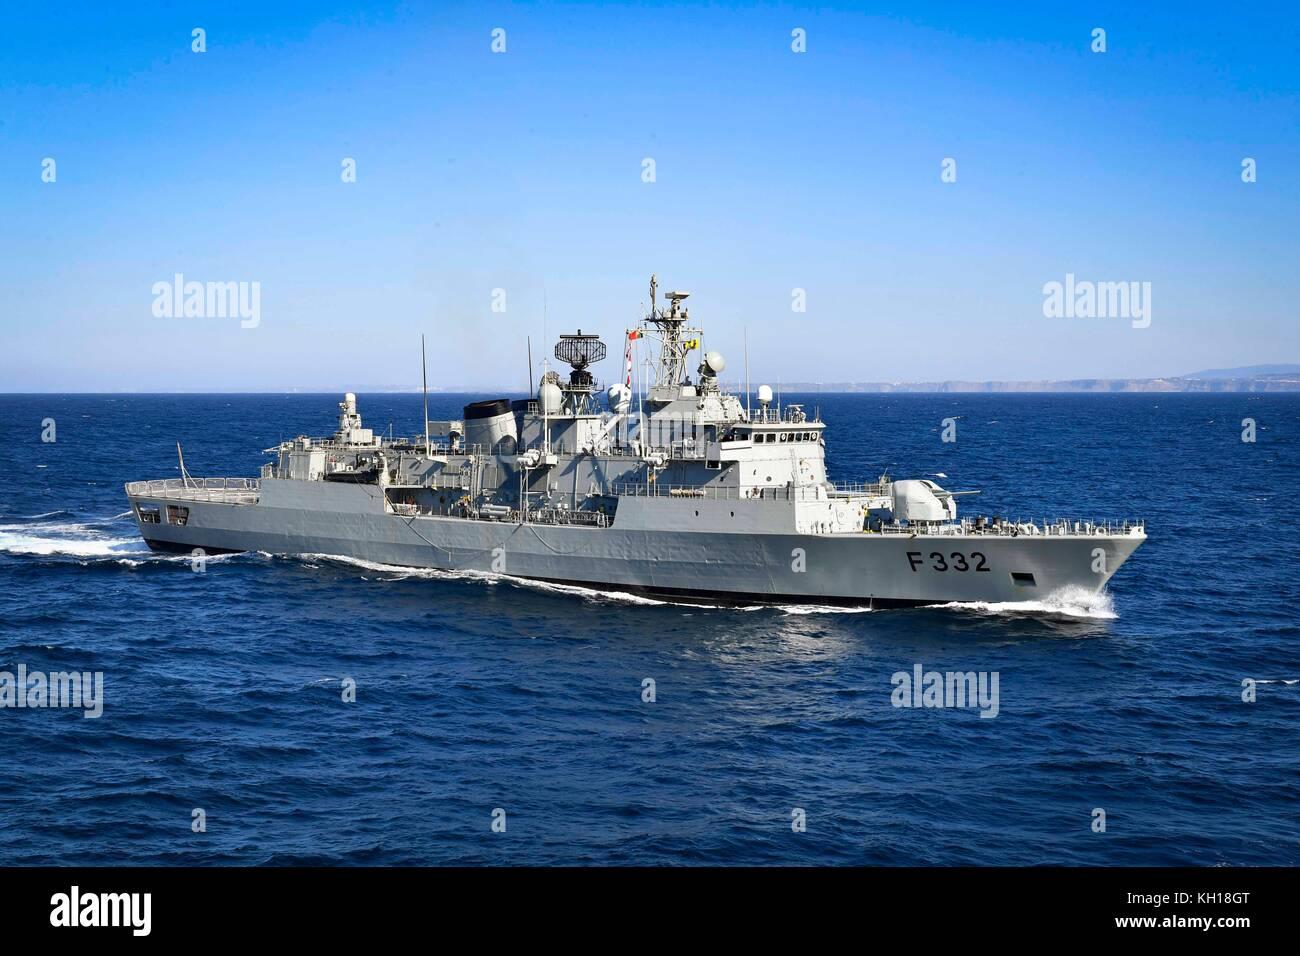 The Portuguese Navy Vasco de Gama-class frigate NRP Corte-Real steams underway November 6, 2017 in the Atlantic - Stock Image